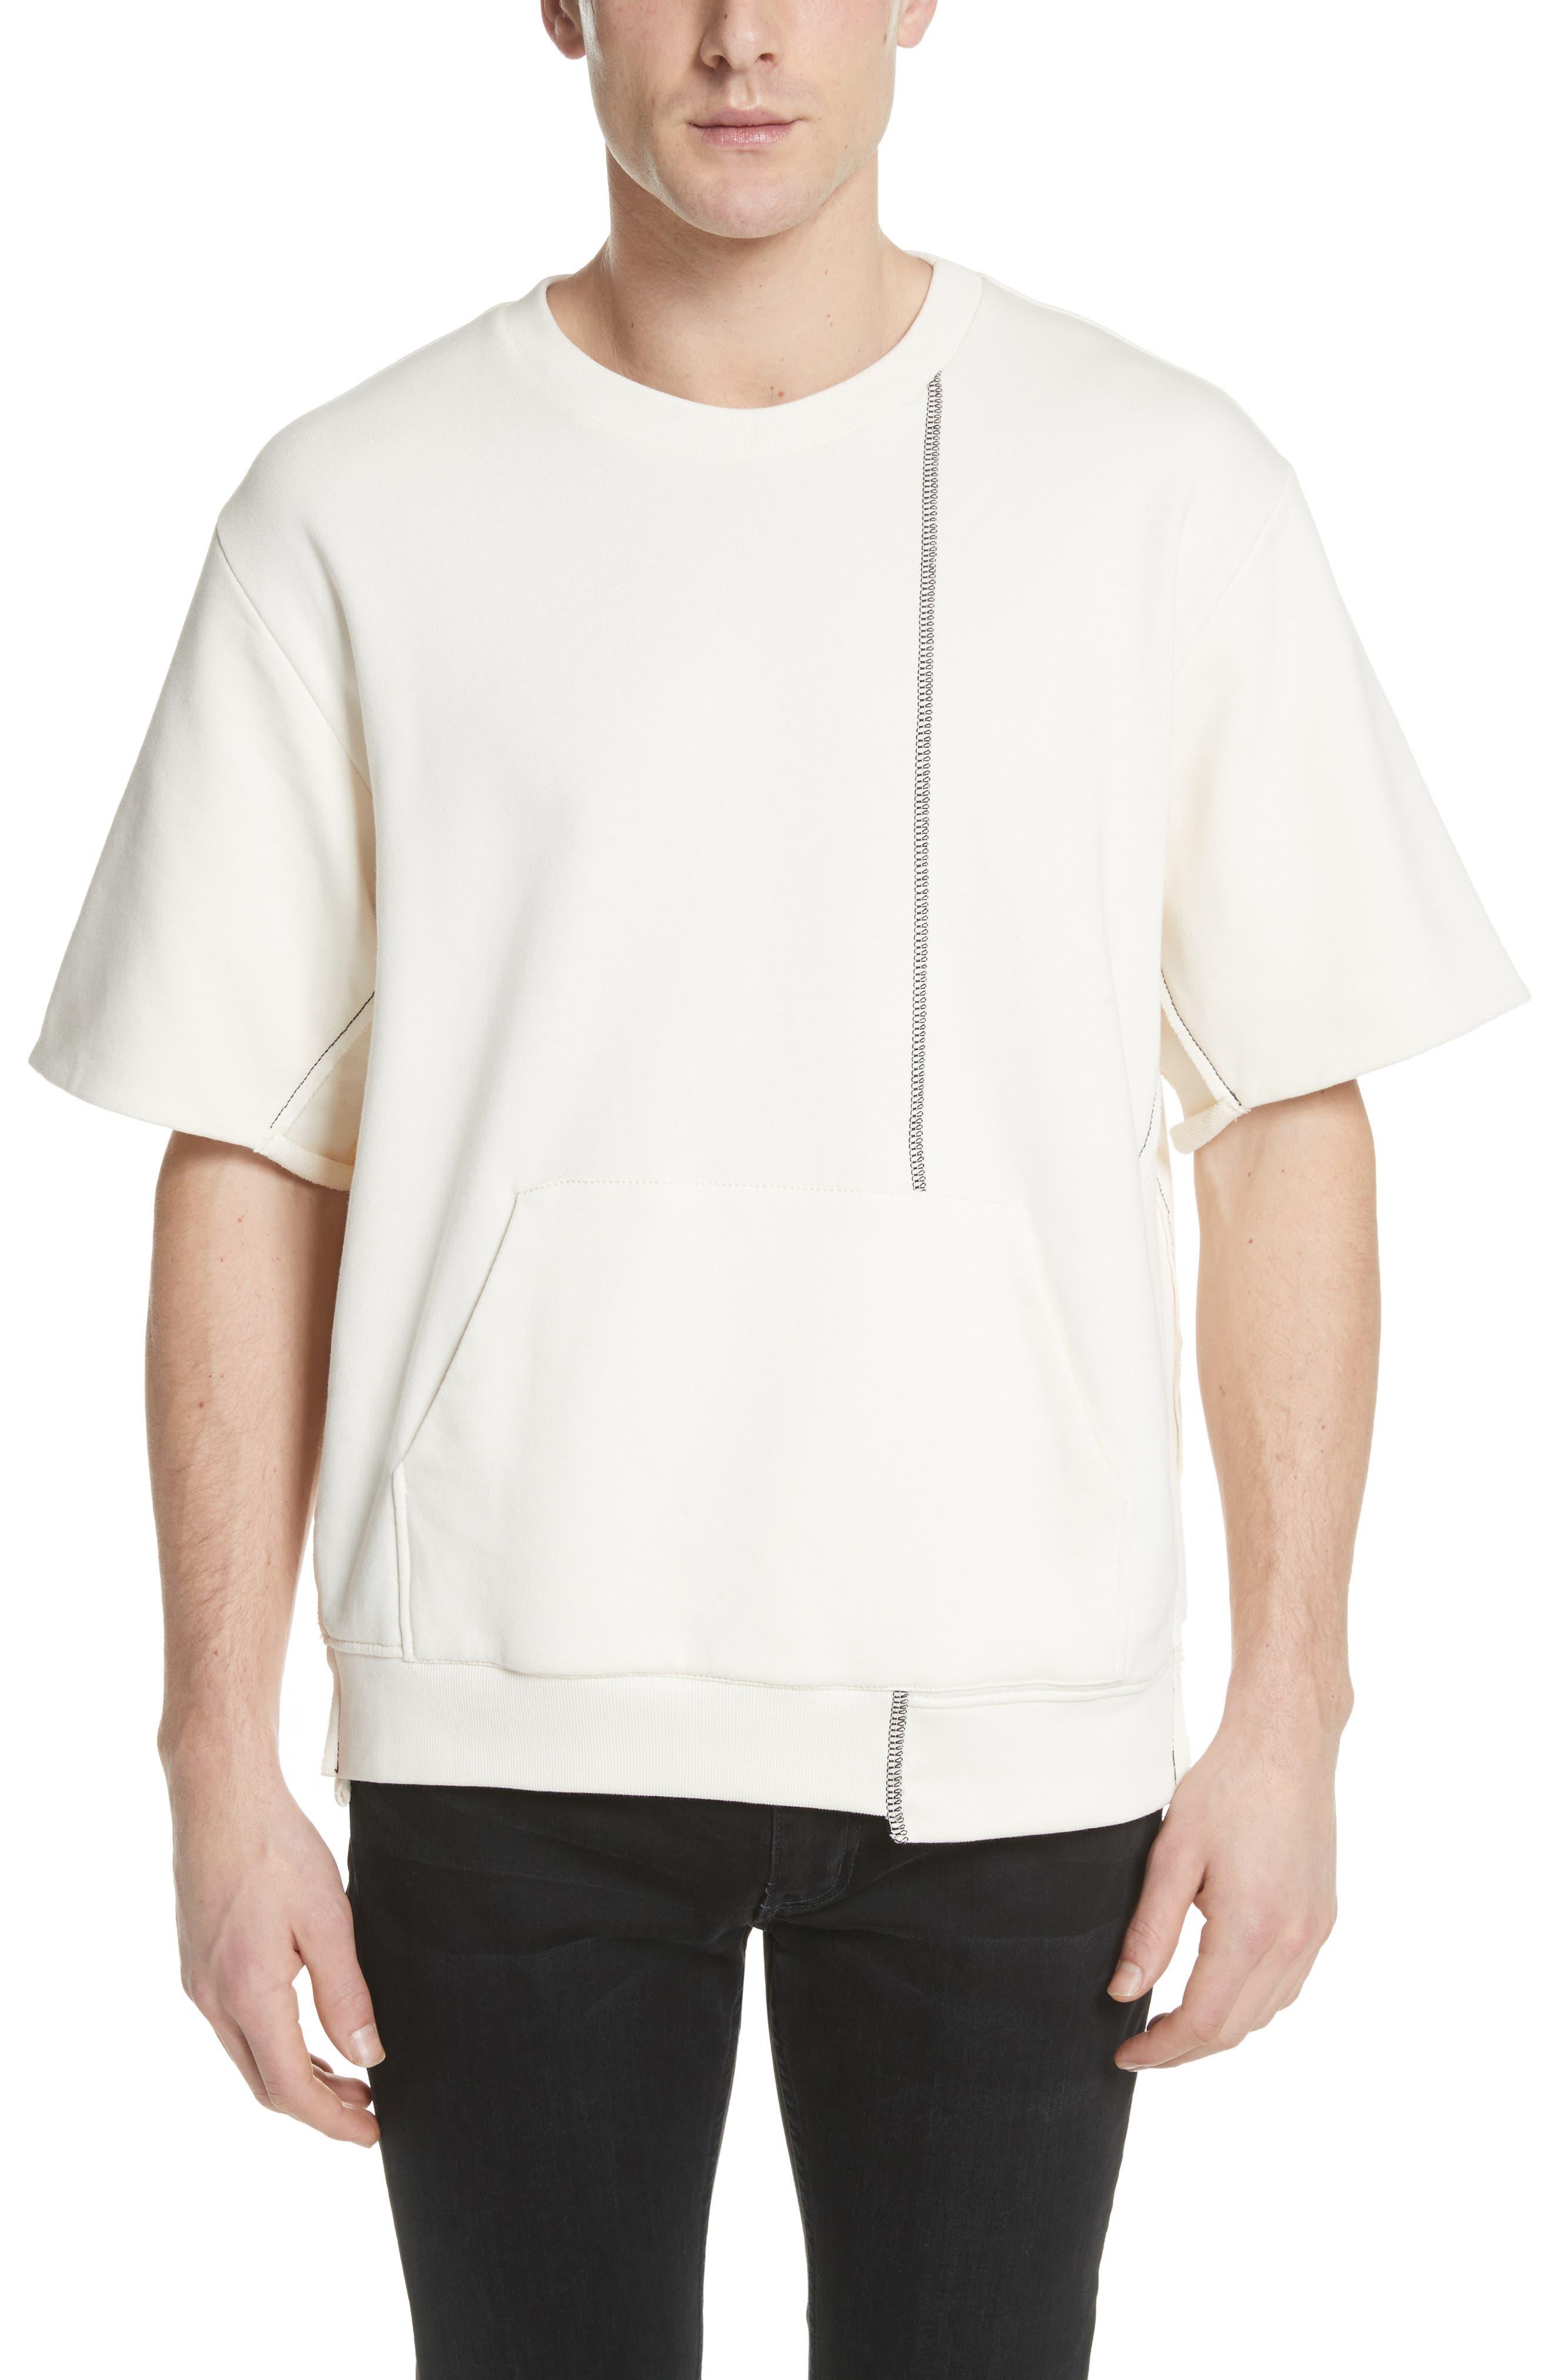 Alternate Image 1 Selected - 3.1 Phillip Lim Reconstructed Short Sleeve Sweatshirt